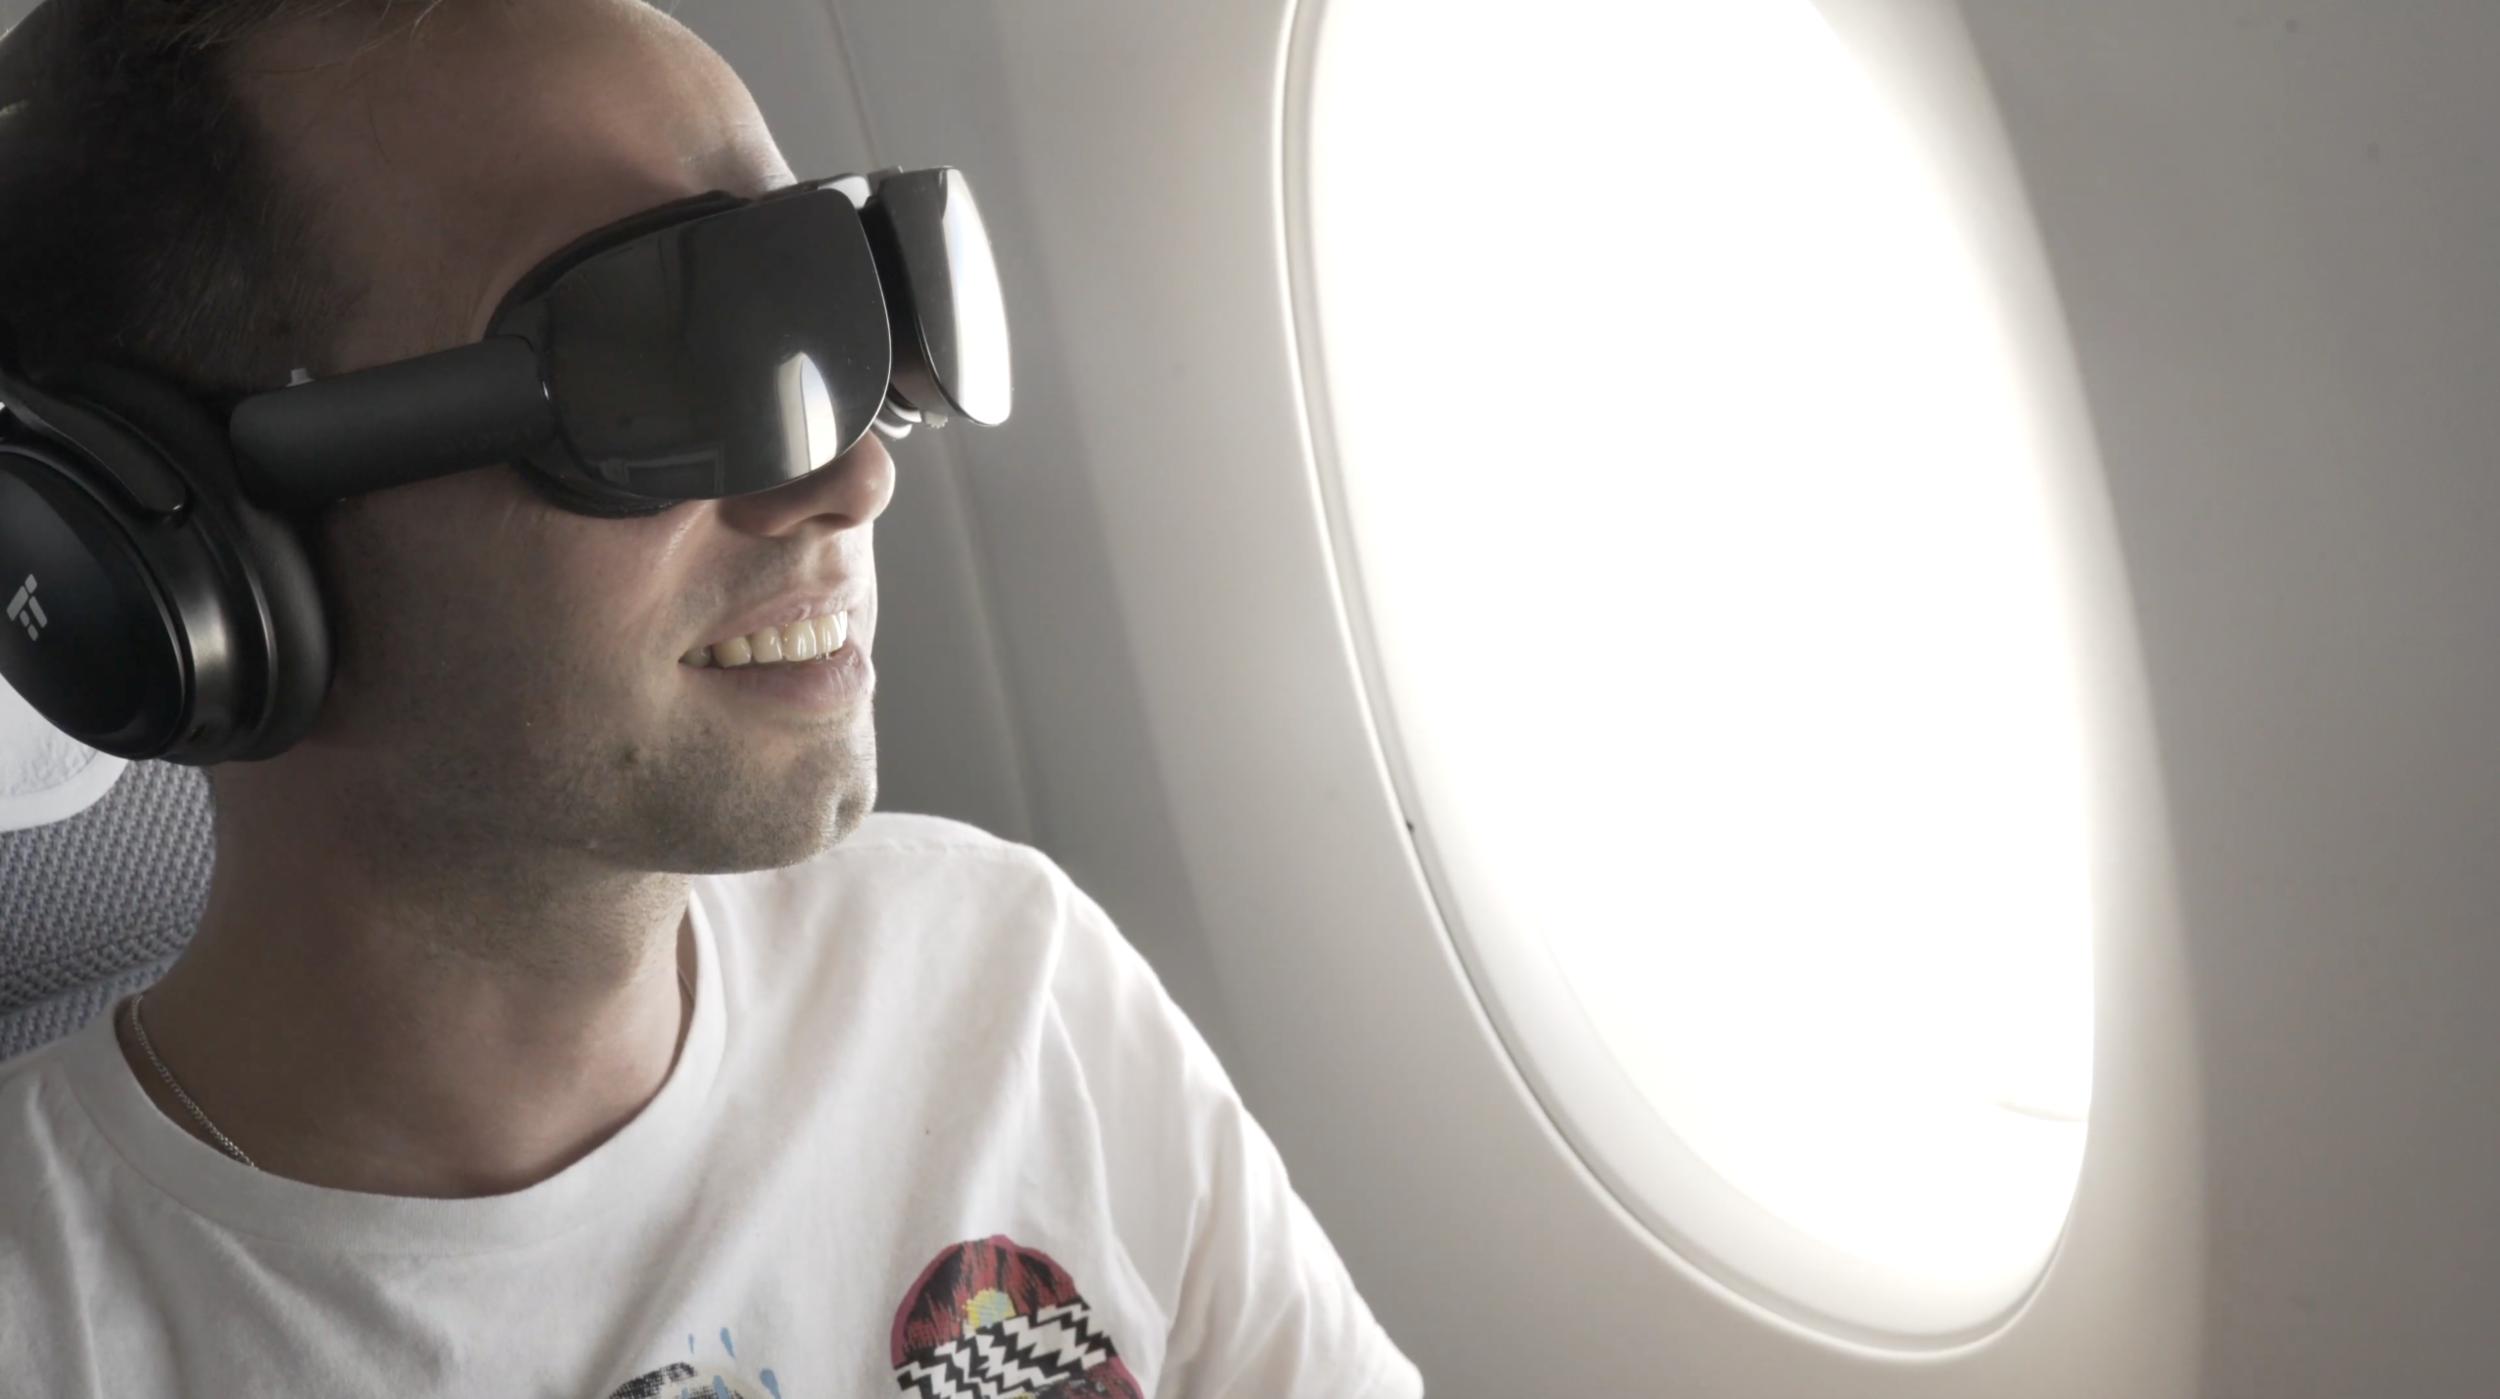 Passenger onboard Lufthansa Flying Lab